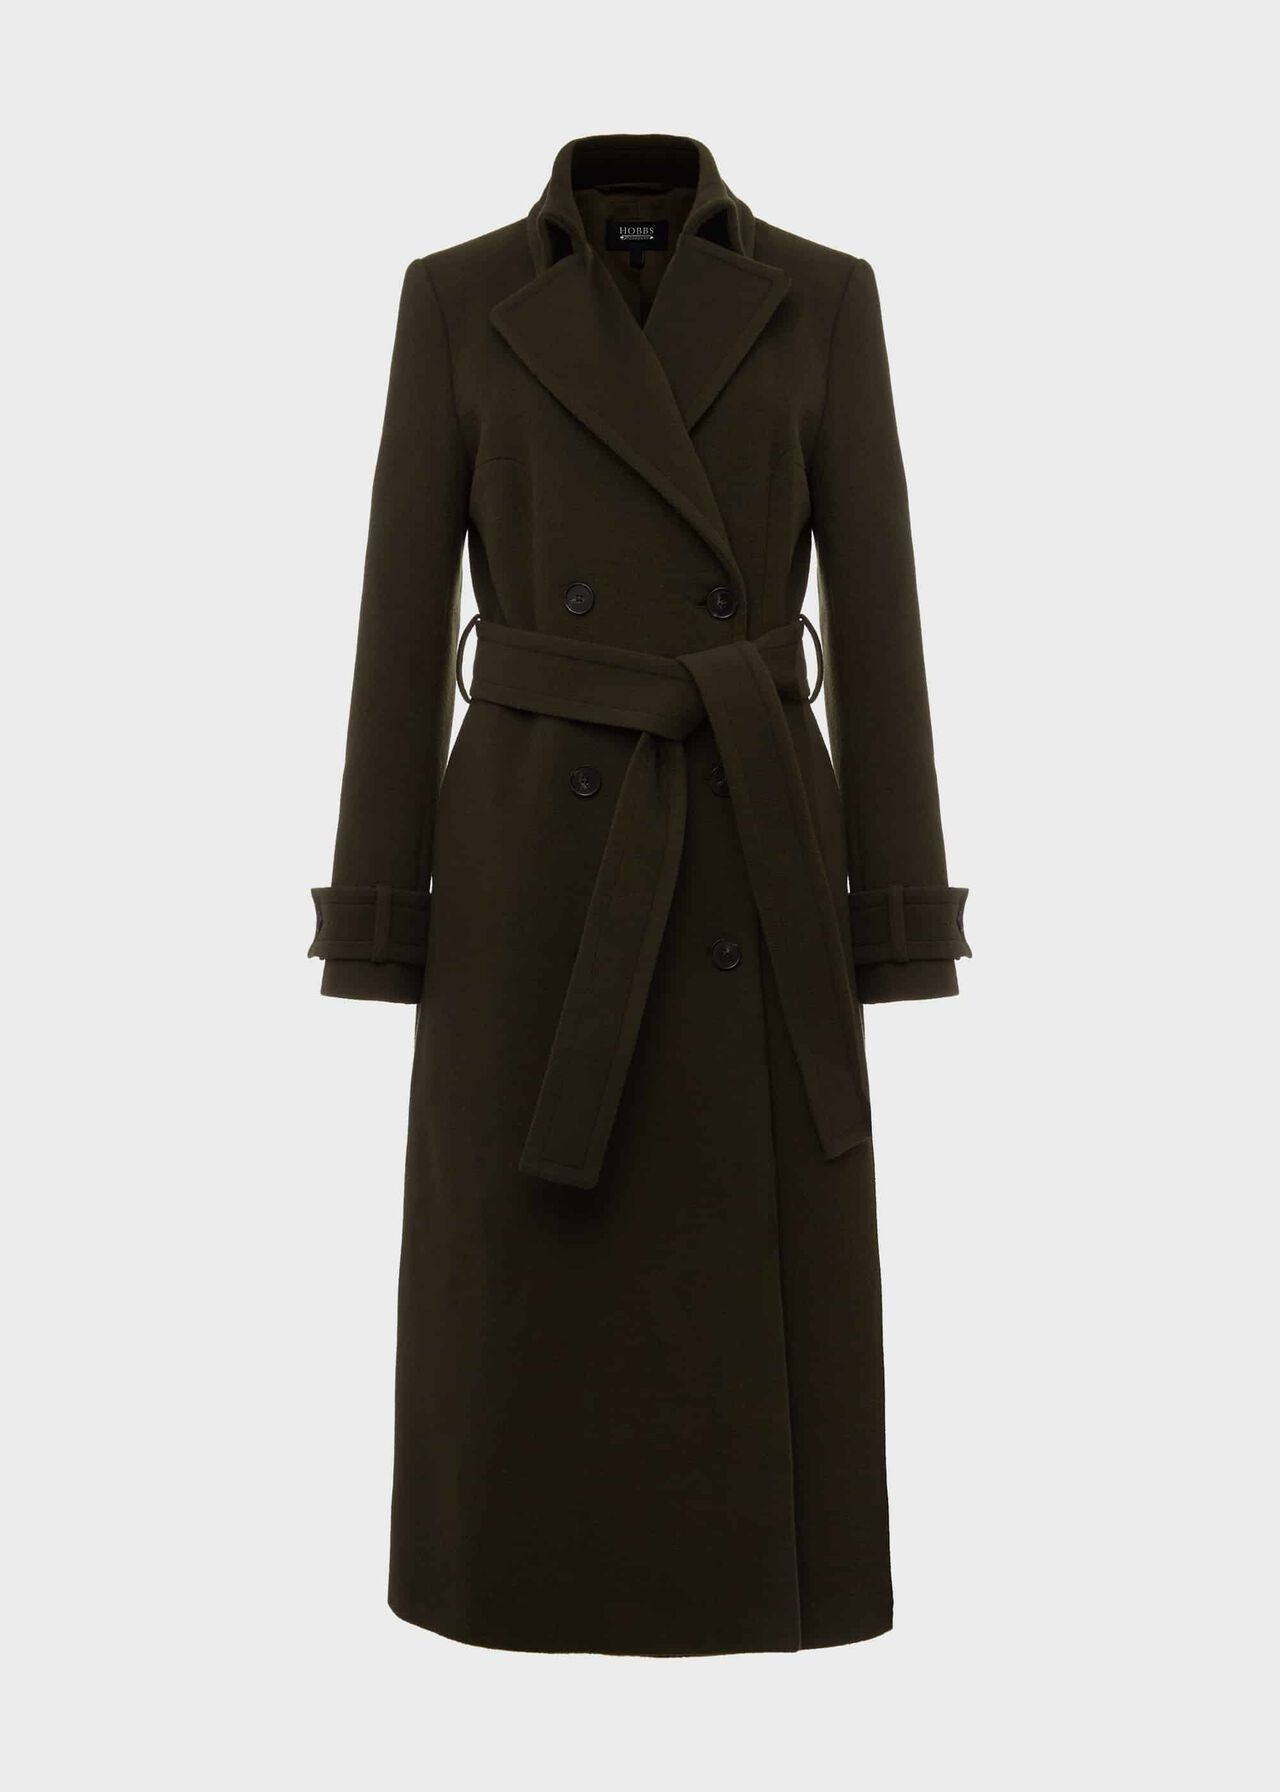 Lori Wool Cashmere Coat Olive